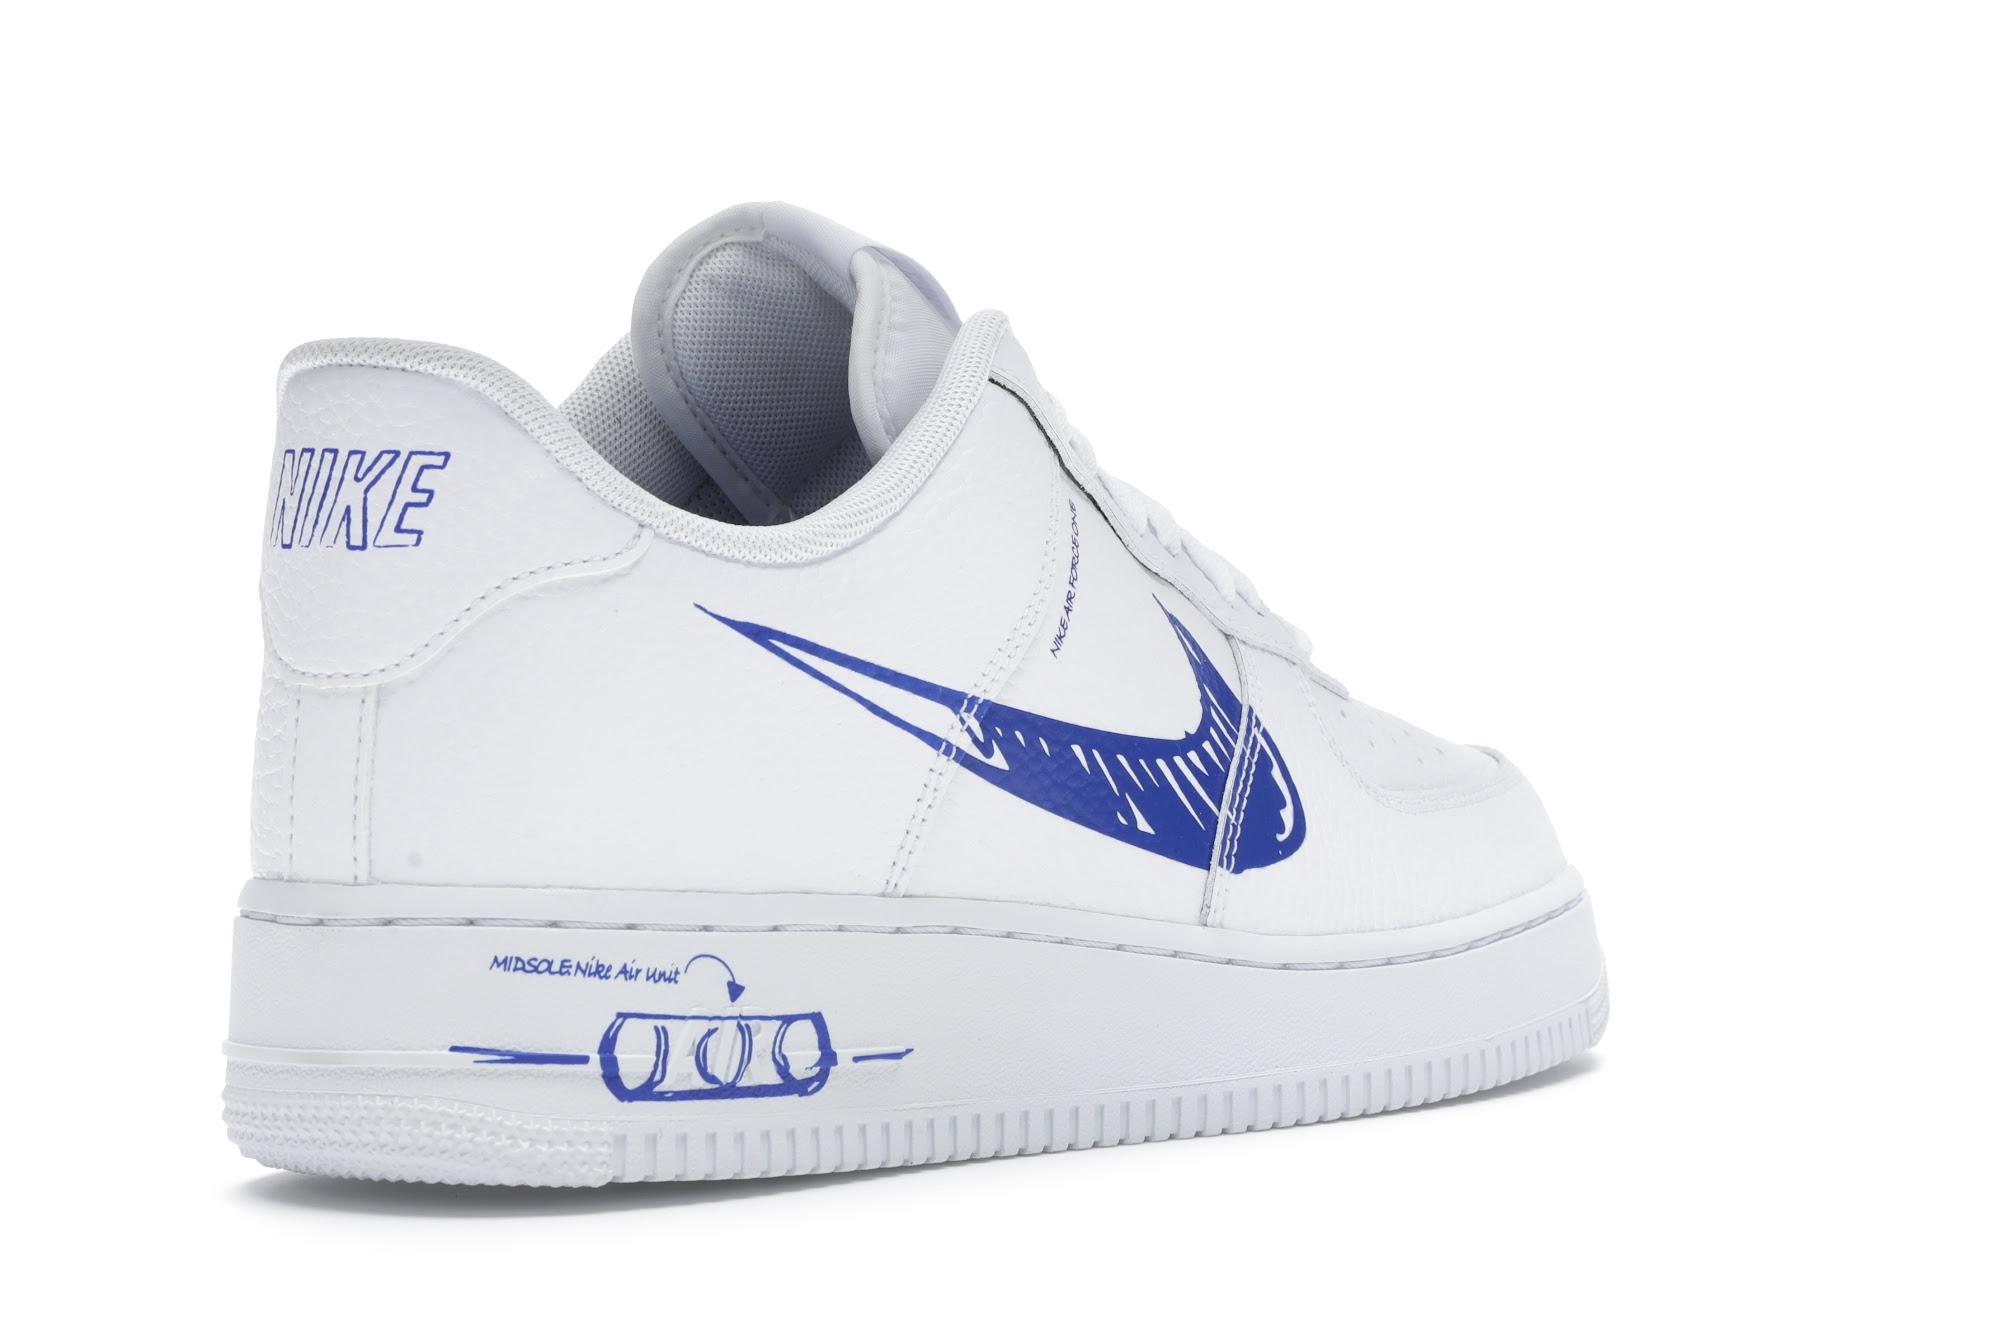 Nike Air Force 1 Low Sketch White Royal - CW7581-100